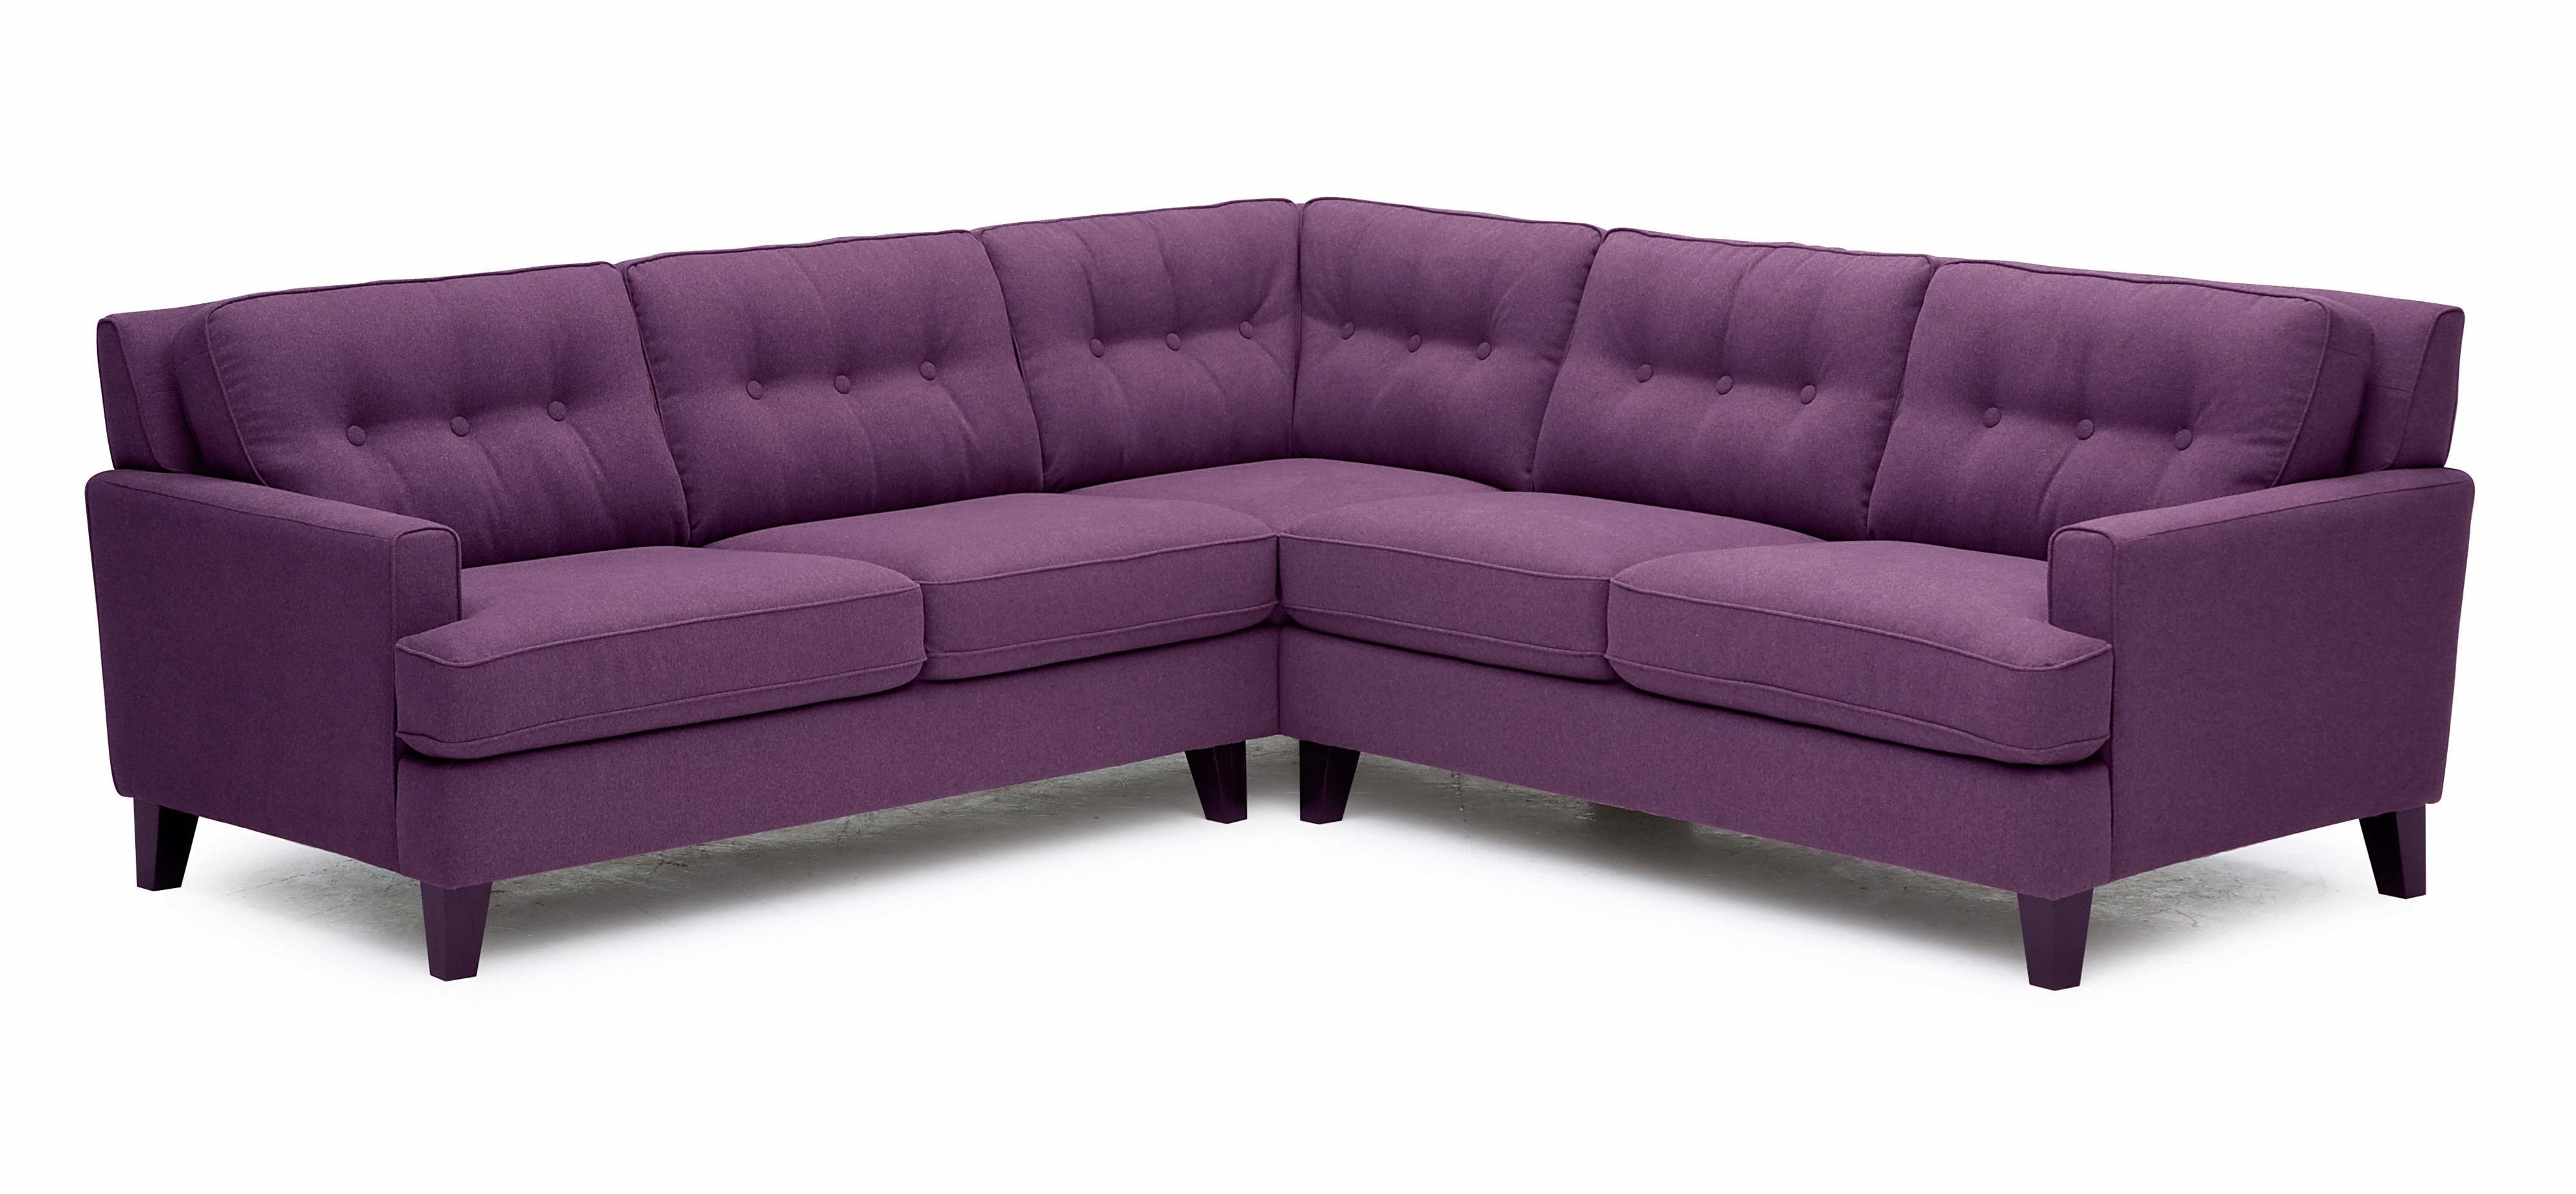 Leather Sofa Nova Scotia Deep Sofas Melbourne Palliser Barbara Transitional Sectional With Lhf